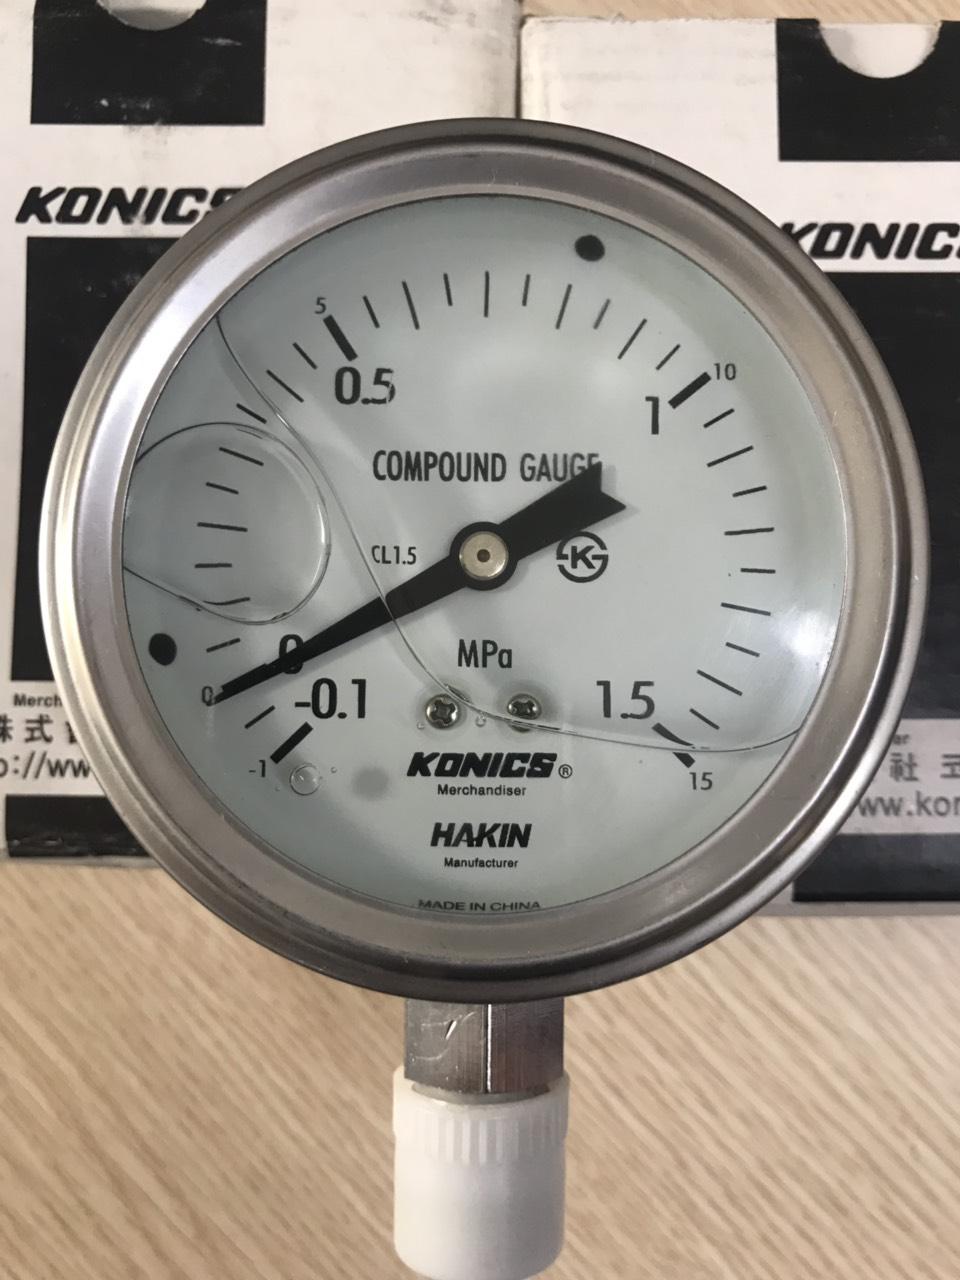 Pneumatic pressure gauges -Konics in Vietnam0